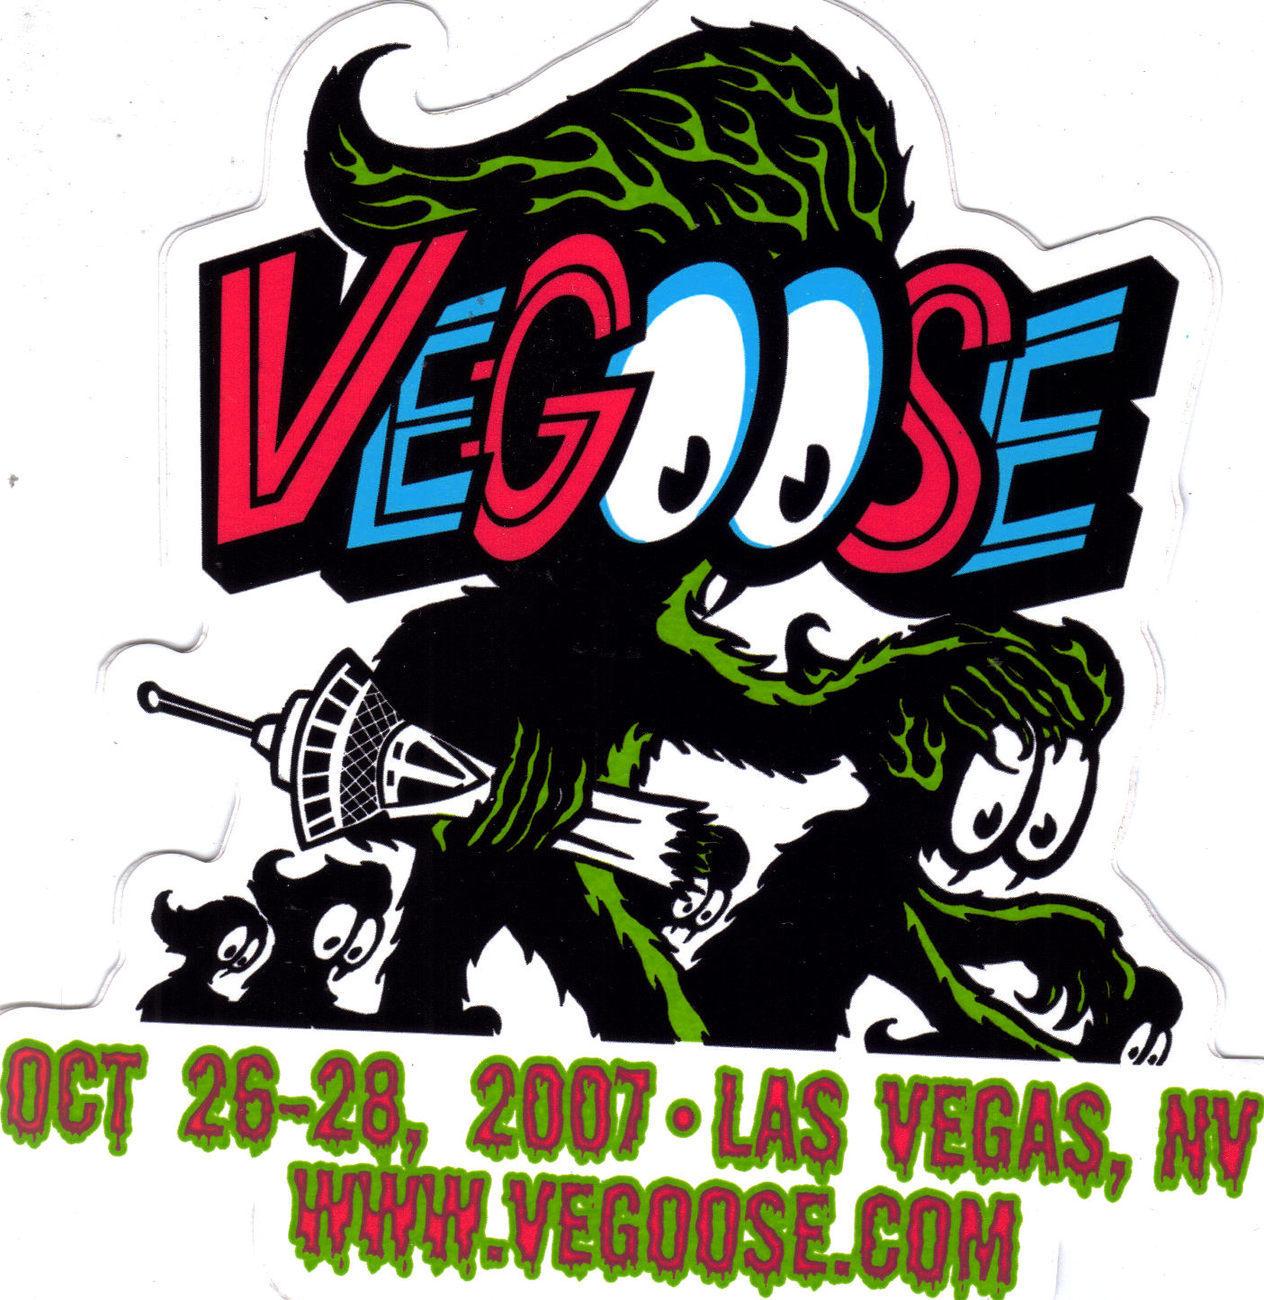 Events vegoose